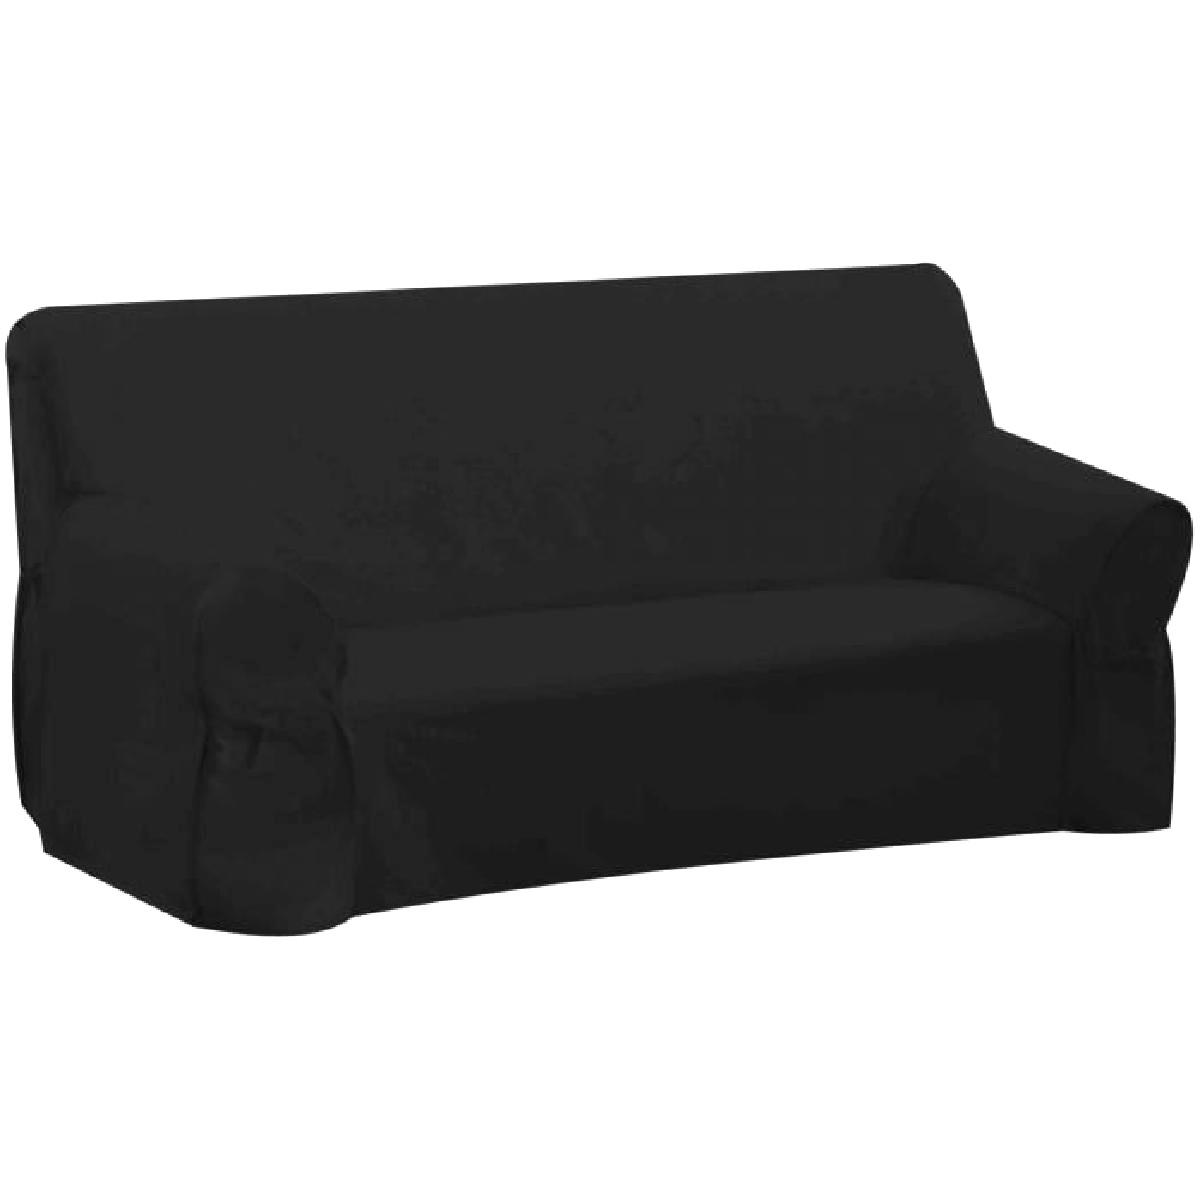 Housse Bz Pas Cher Ikea Nouveau Photos Awesome sofa 1 Place S Joshkrajcik Us Joshkrajcik Us Avec